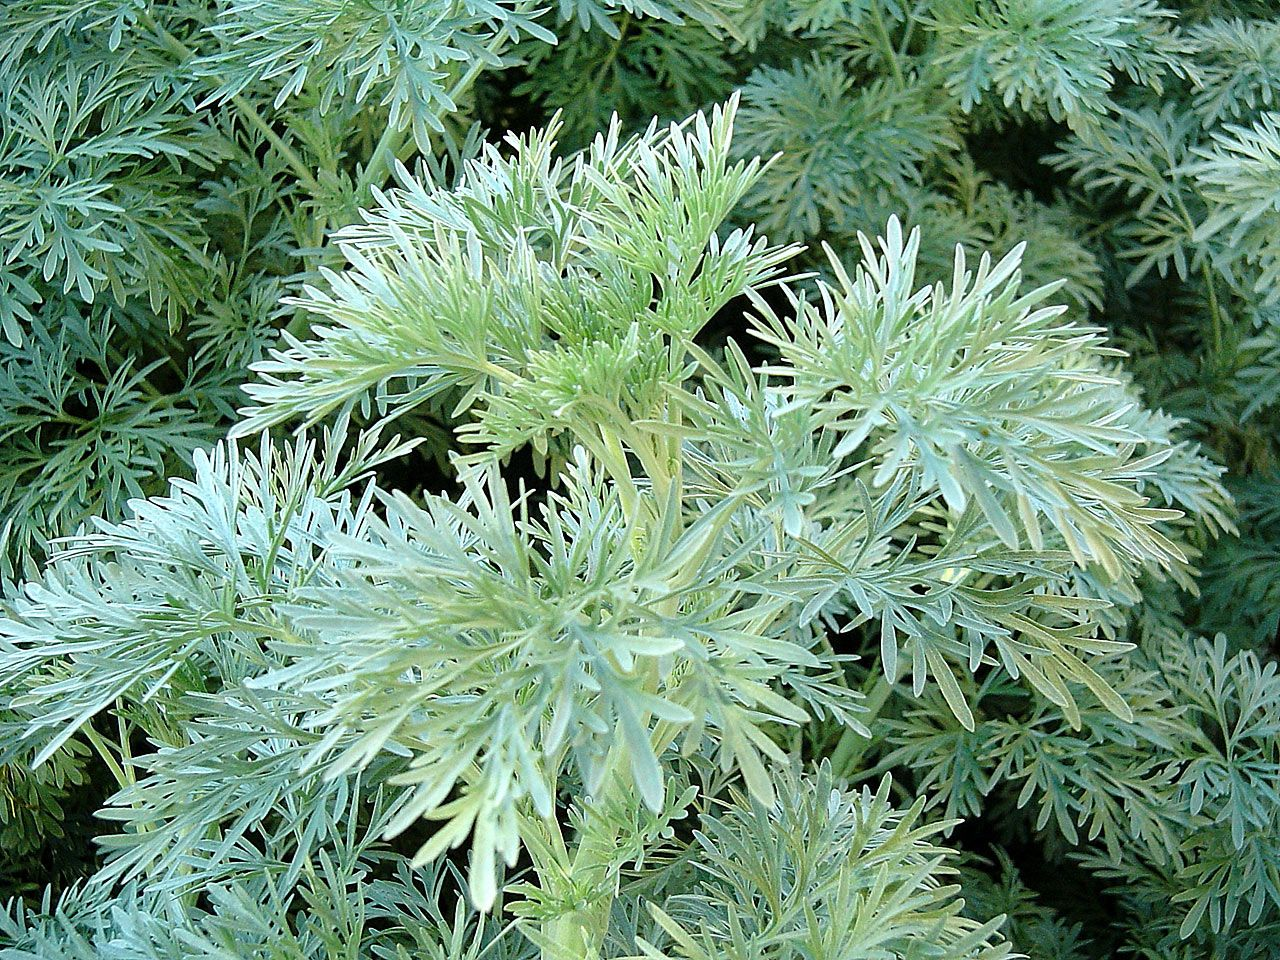 artemesia 'powis castle': wormwood. #foliage #silver #contrast